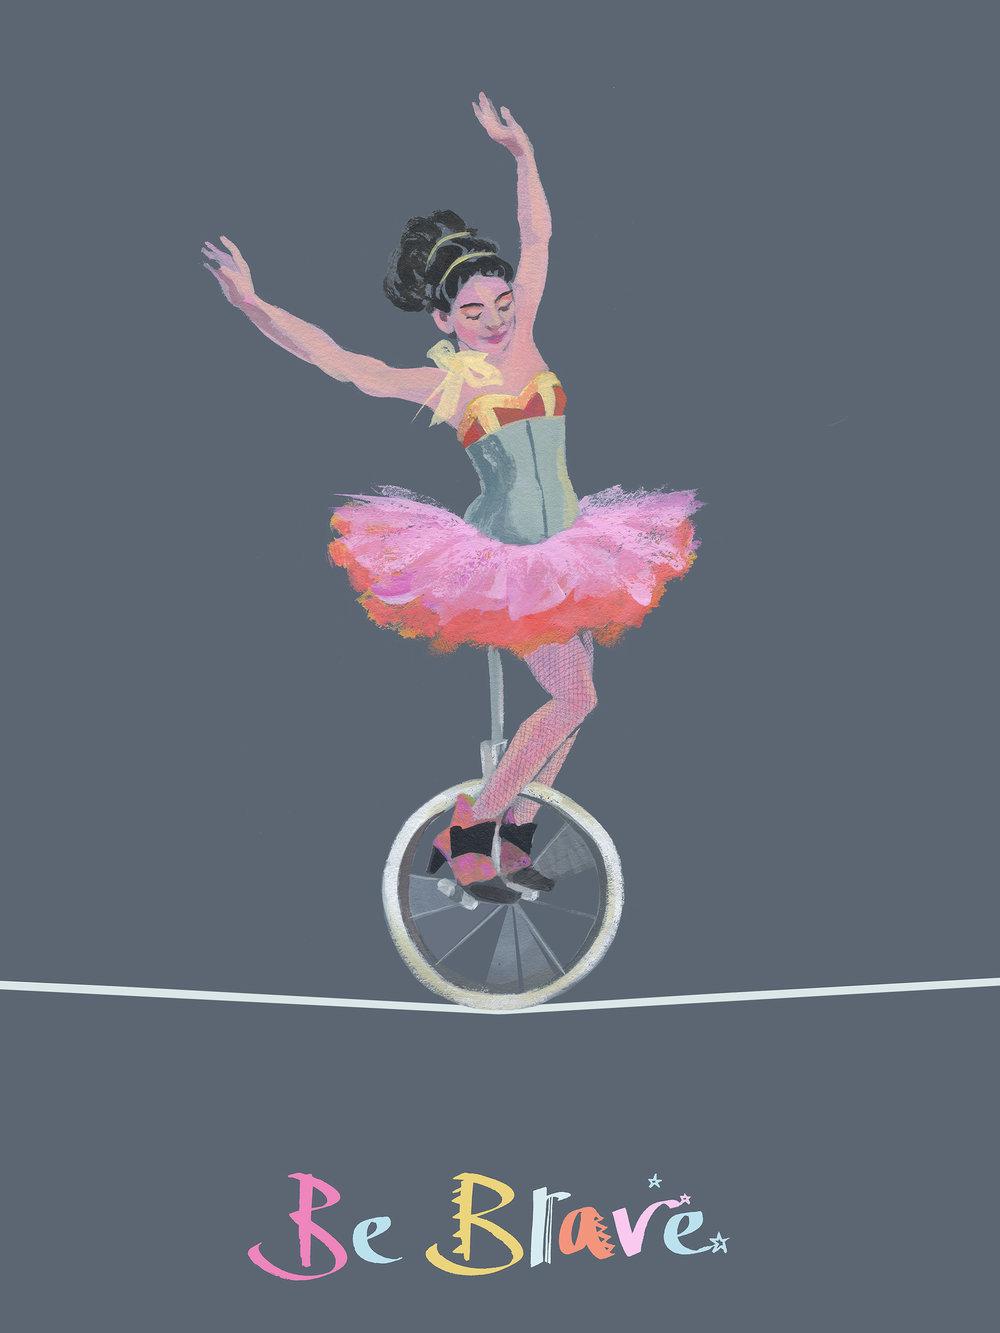 unicycling-ballerina-by-gabriella-buckingham.jpg